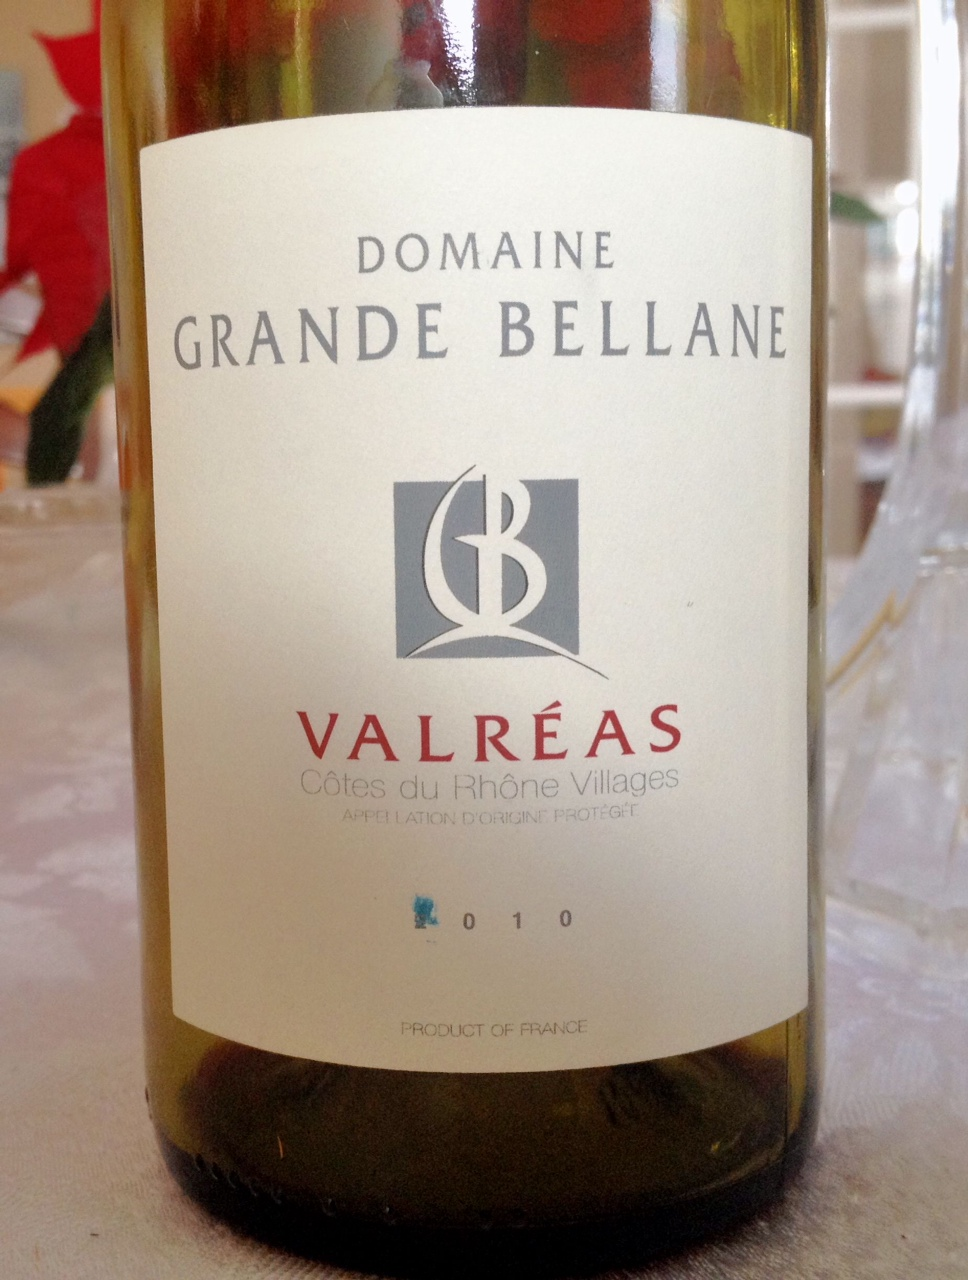 Valreas Cotes du Rhone Villages